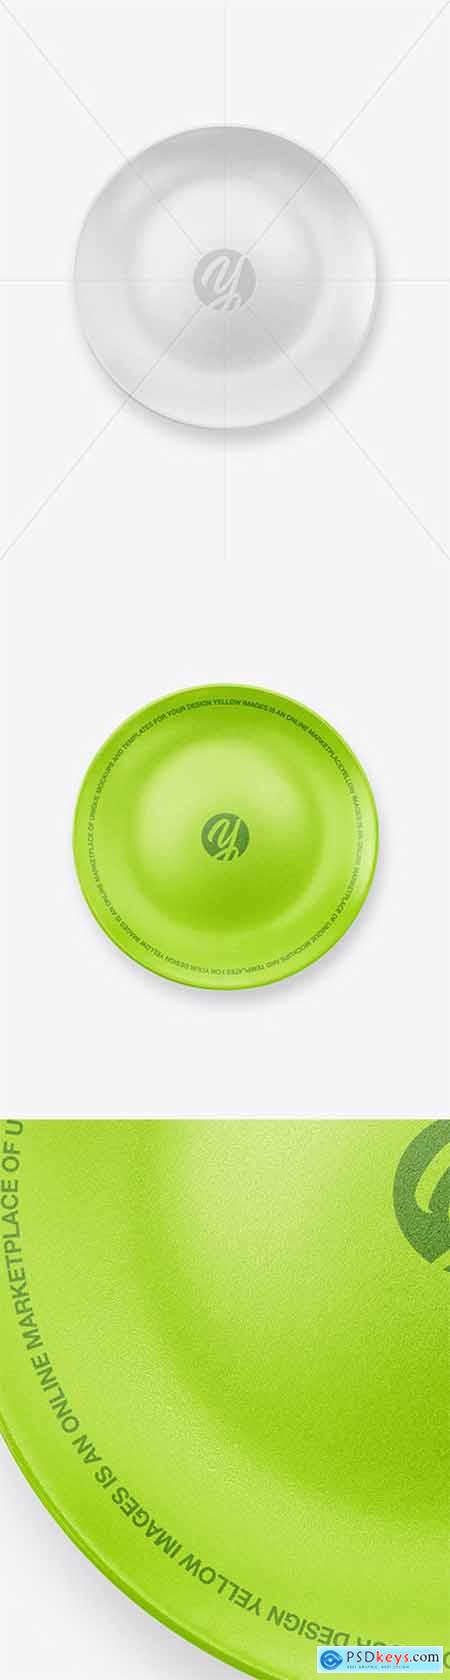 Plate Mockup 64513